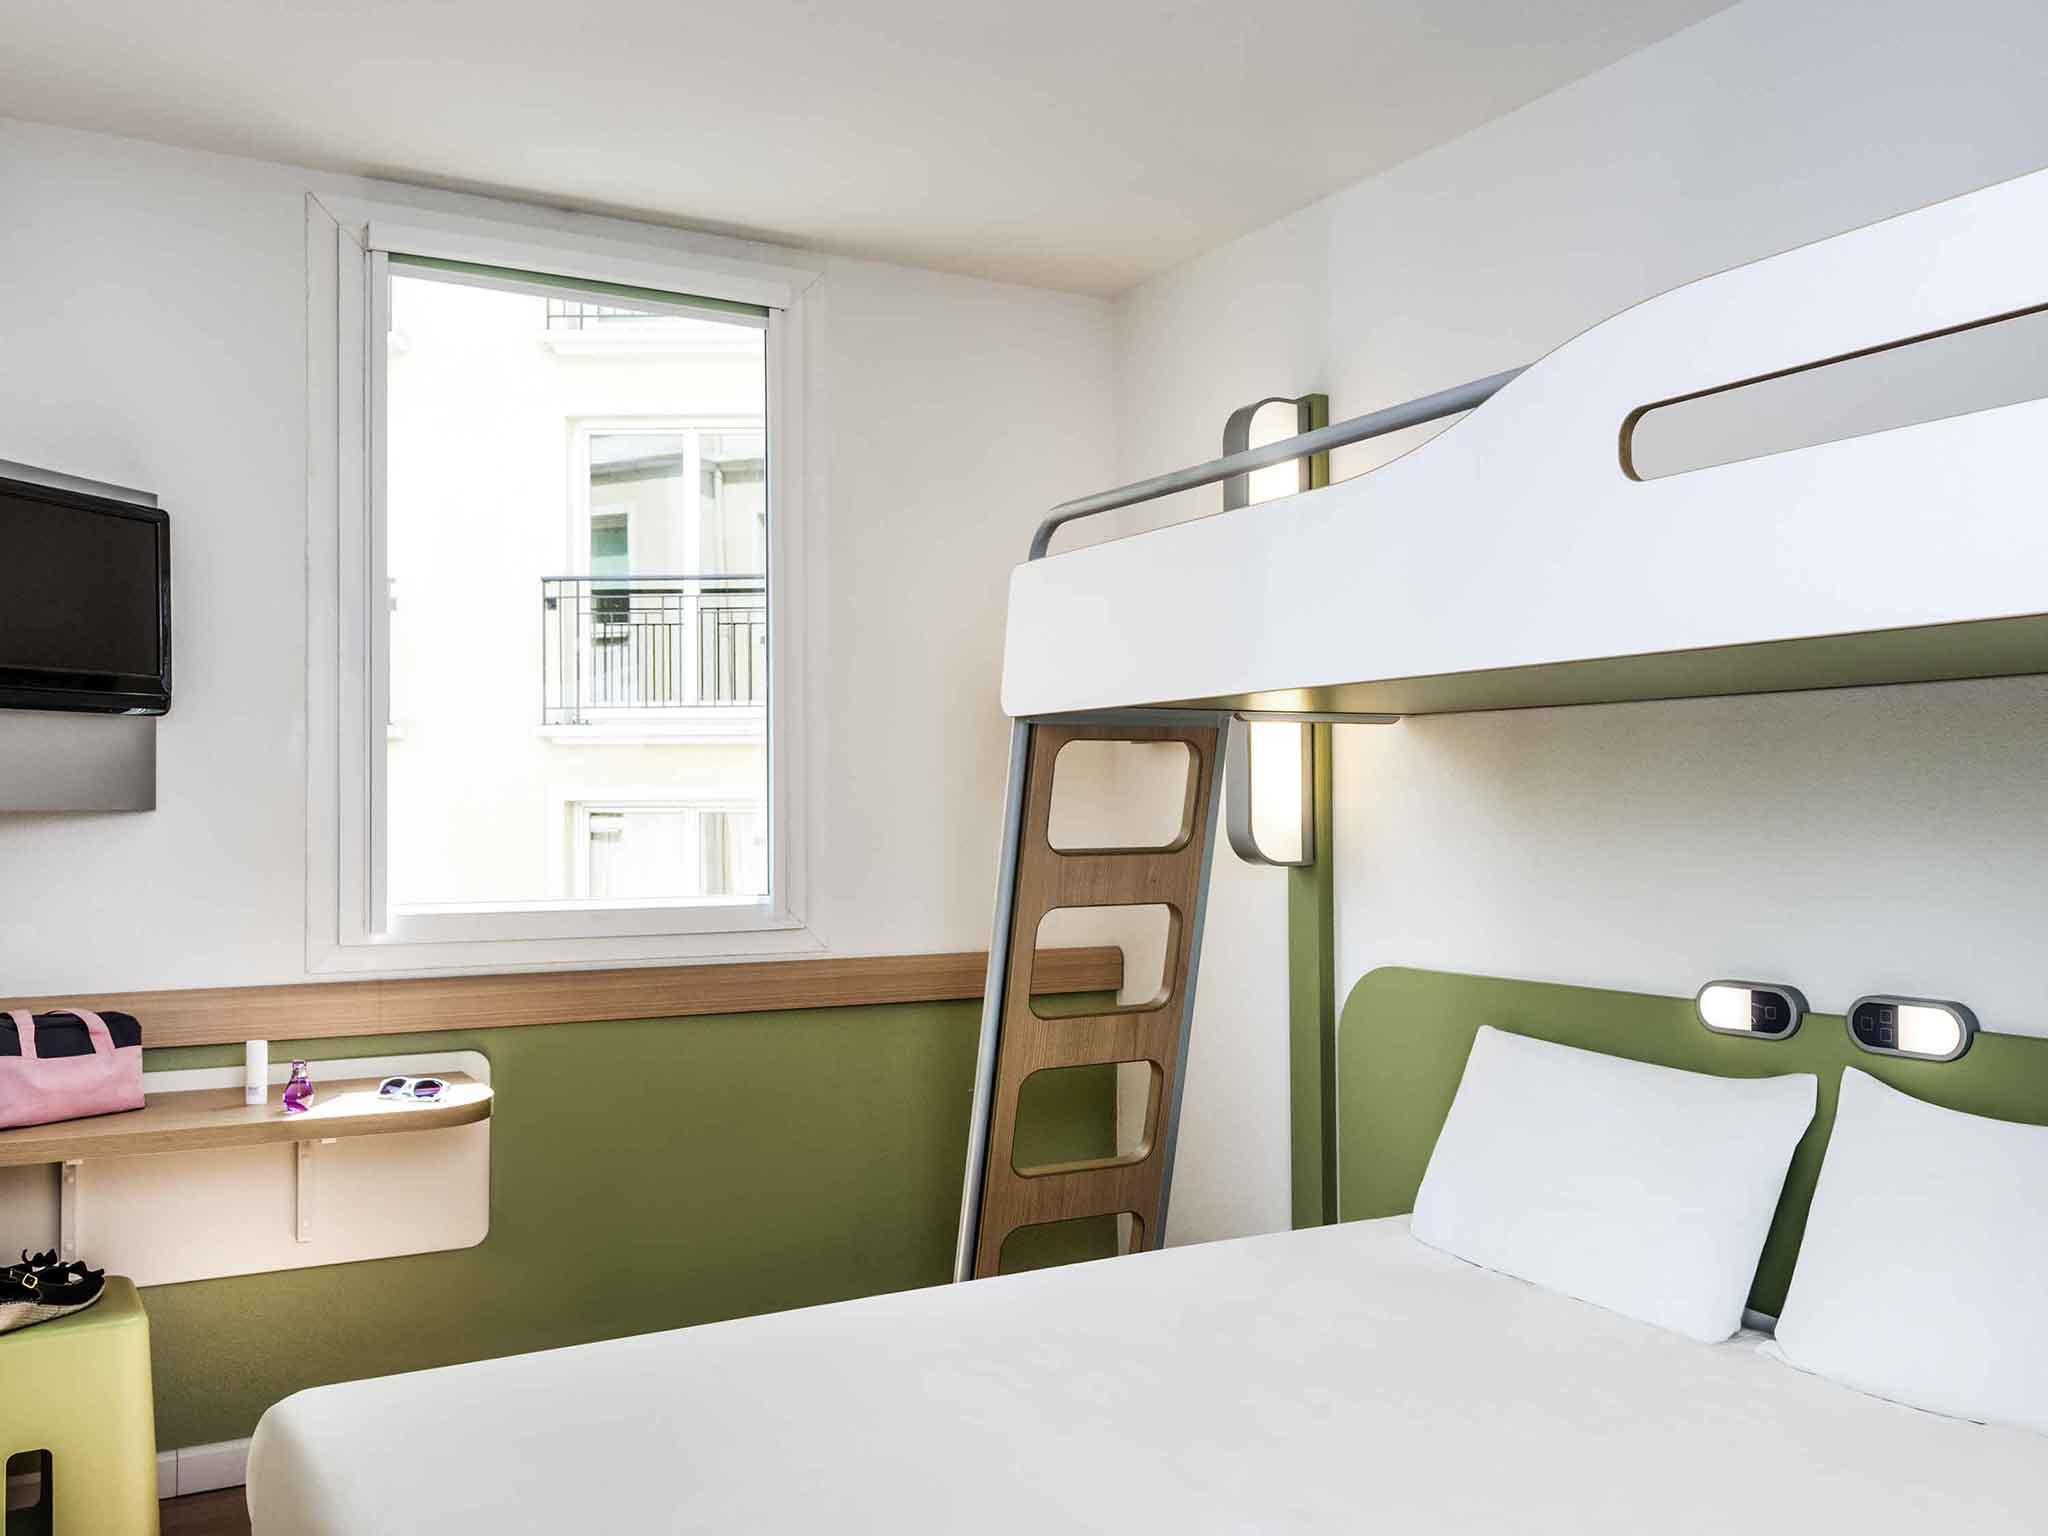 Tarif maison france confort france confort prix modle de for Prix hotel france